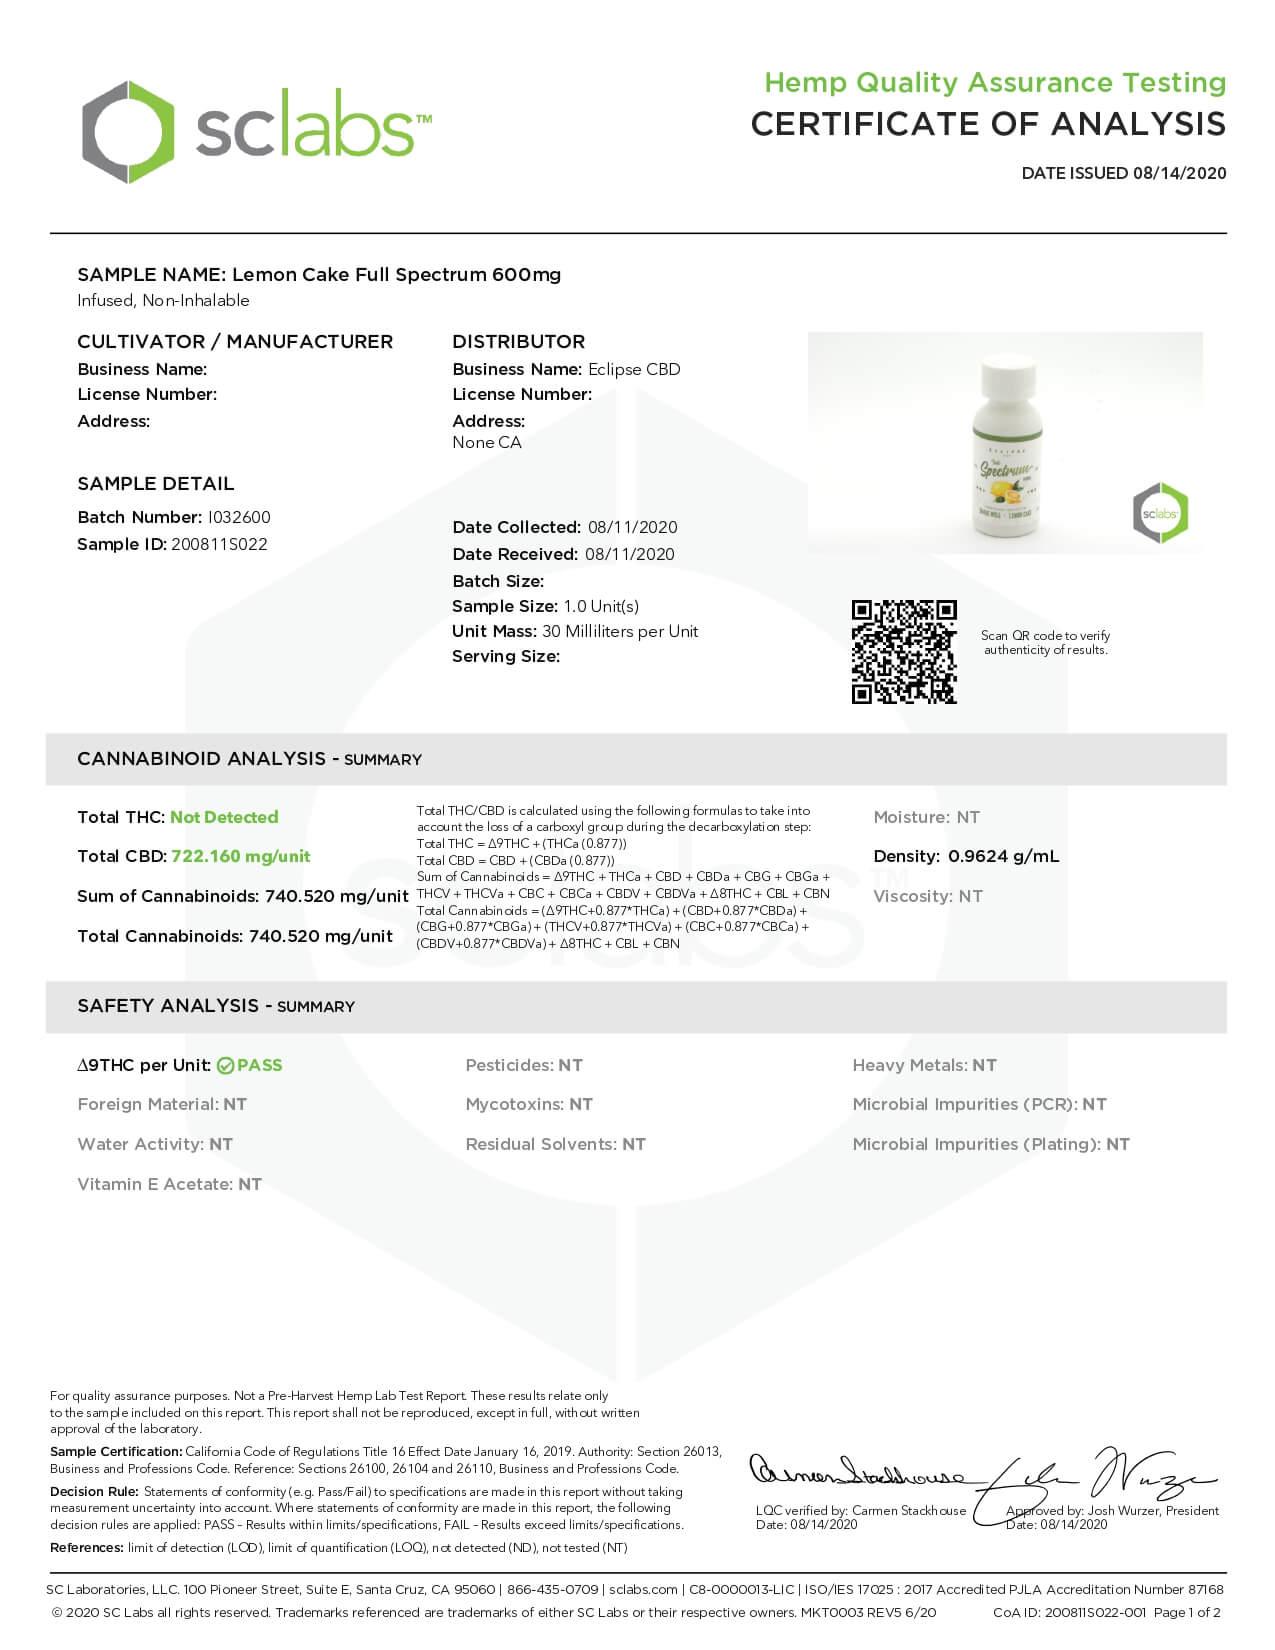 Eclipse CBD Tincture Full Spectrum Lemon Cake 600mg Lab Report